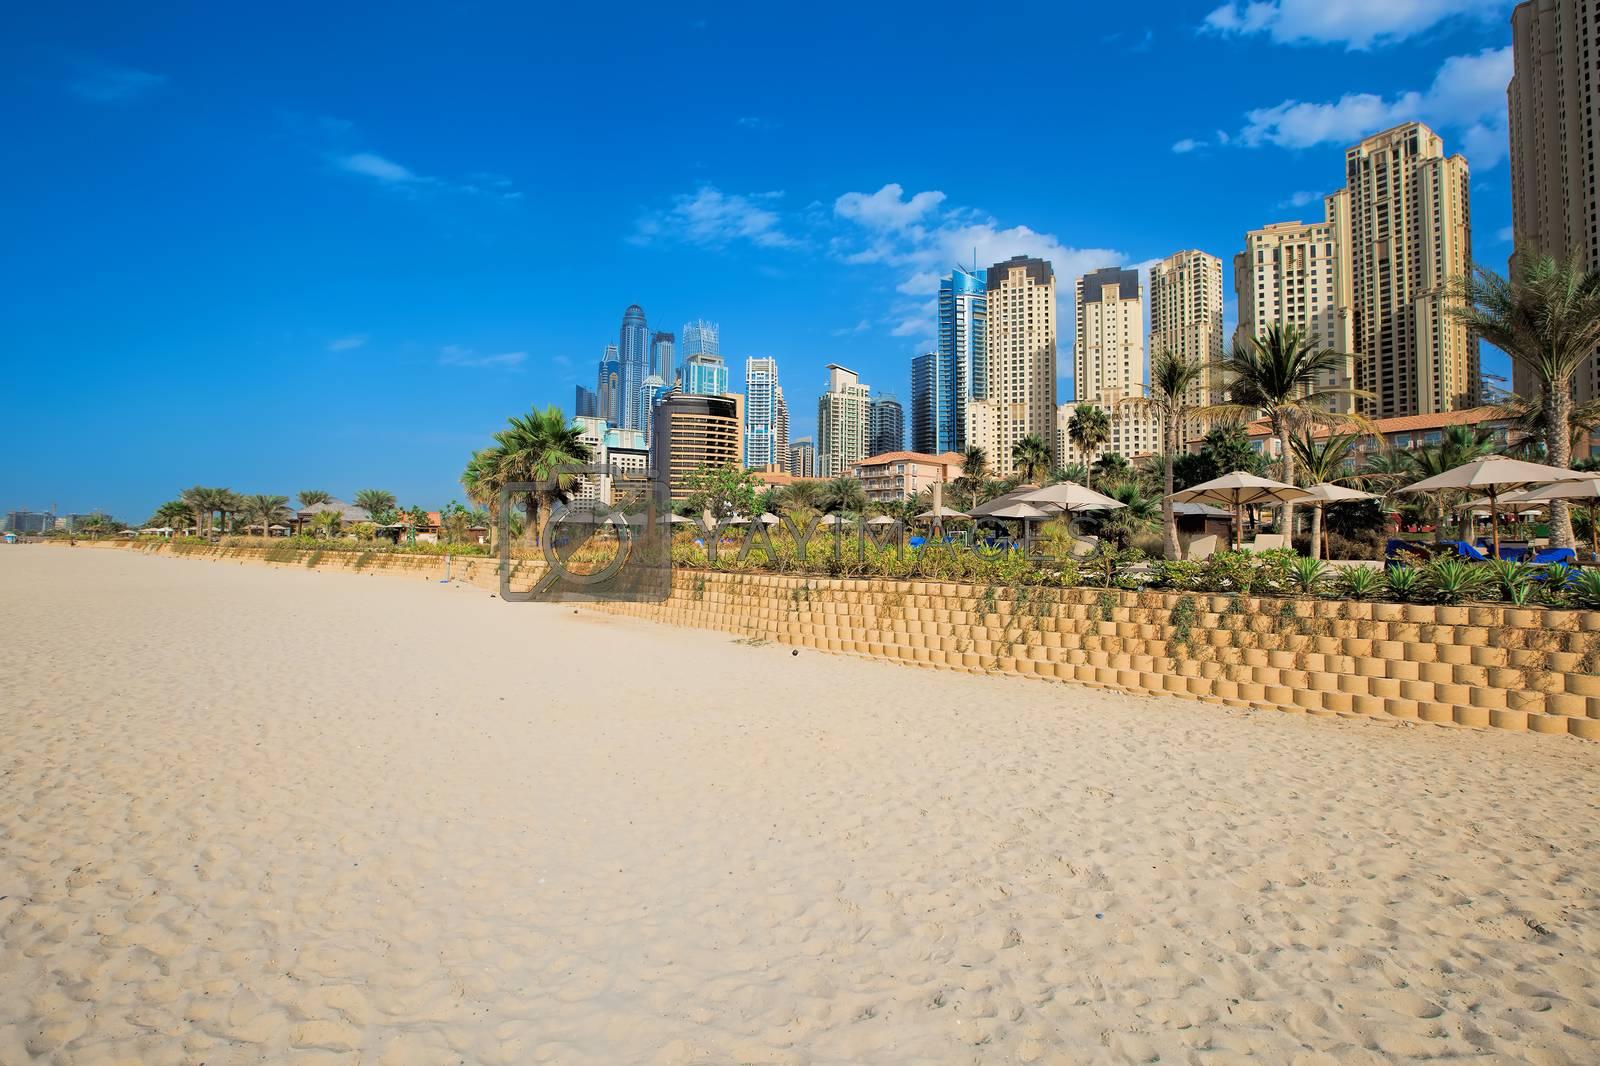 Beach and skyscrapers at Jumeirah beach in Dubai marina